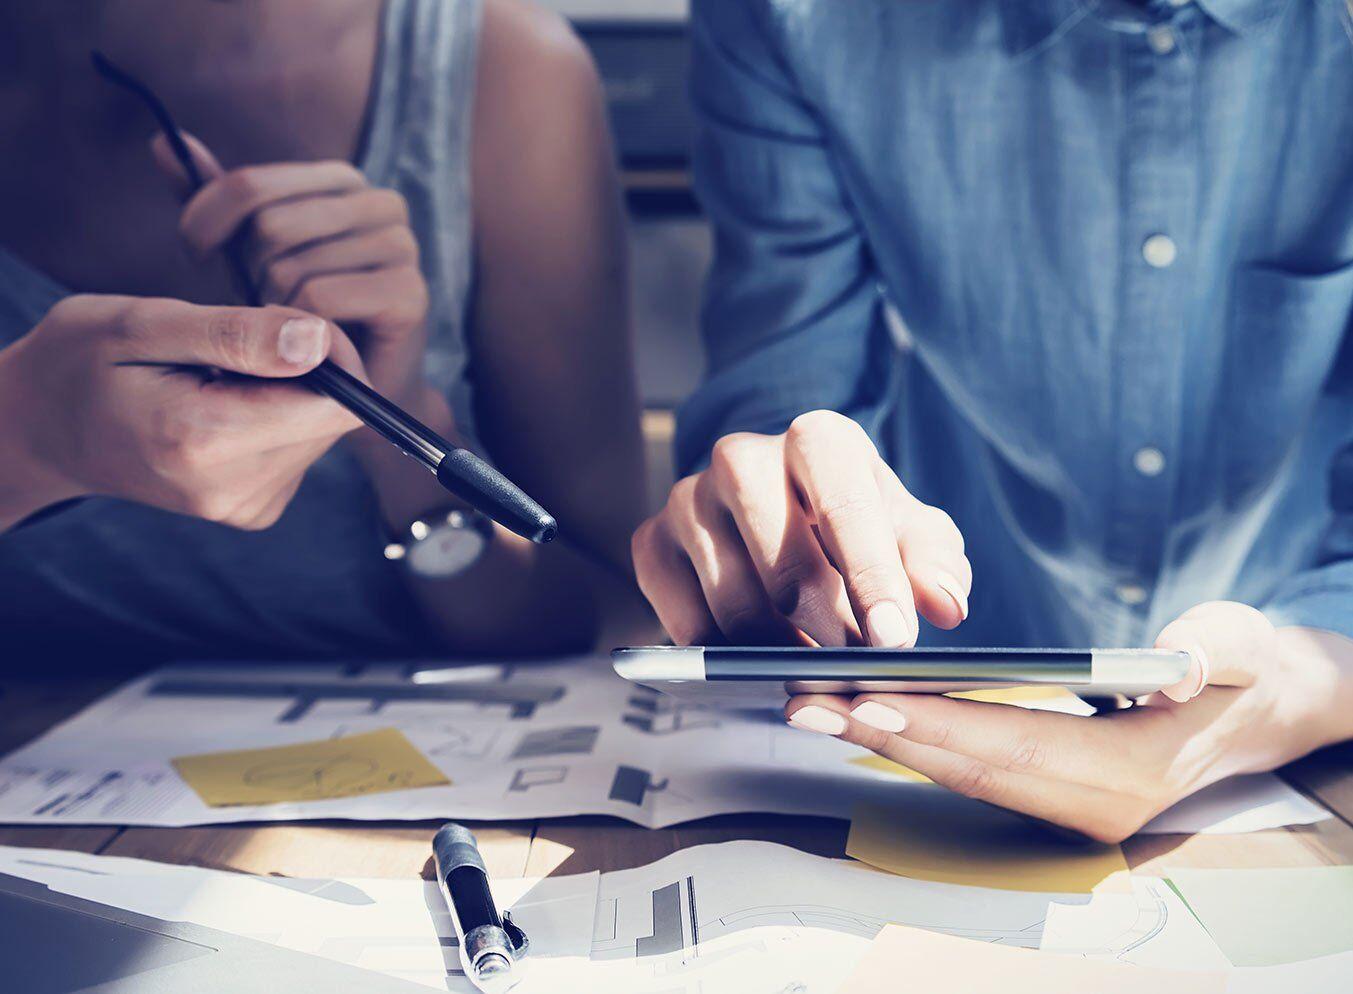 Digital auditing goals & KPI's